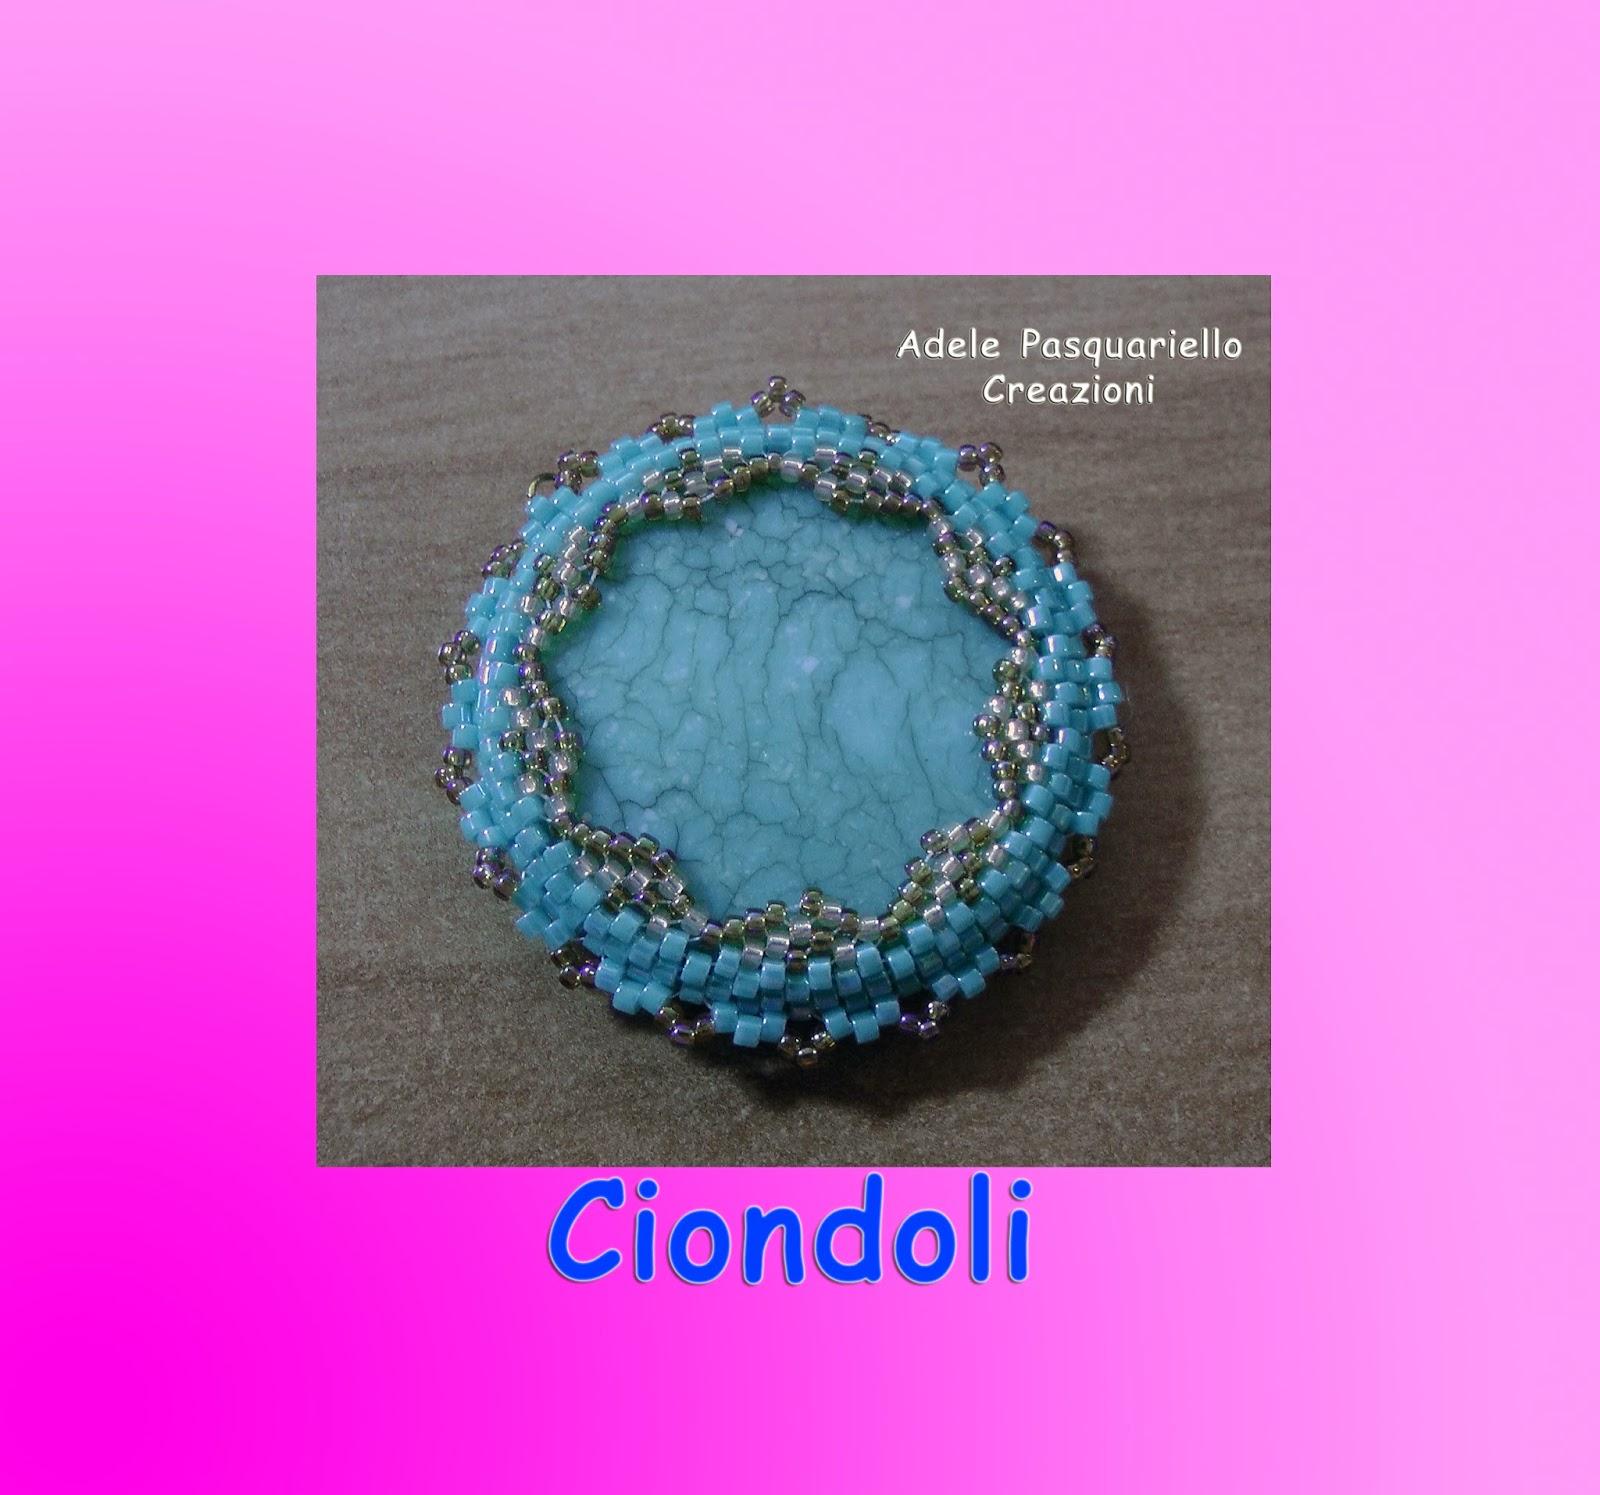 http://adelepasquariello.blogspot.it/2014/02/ciondoli.html